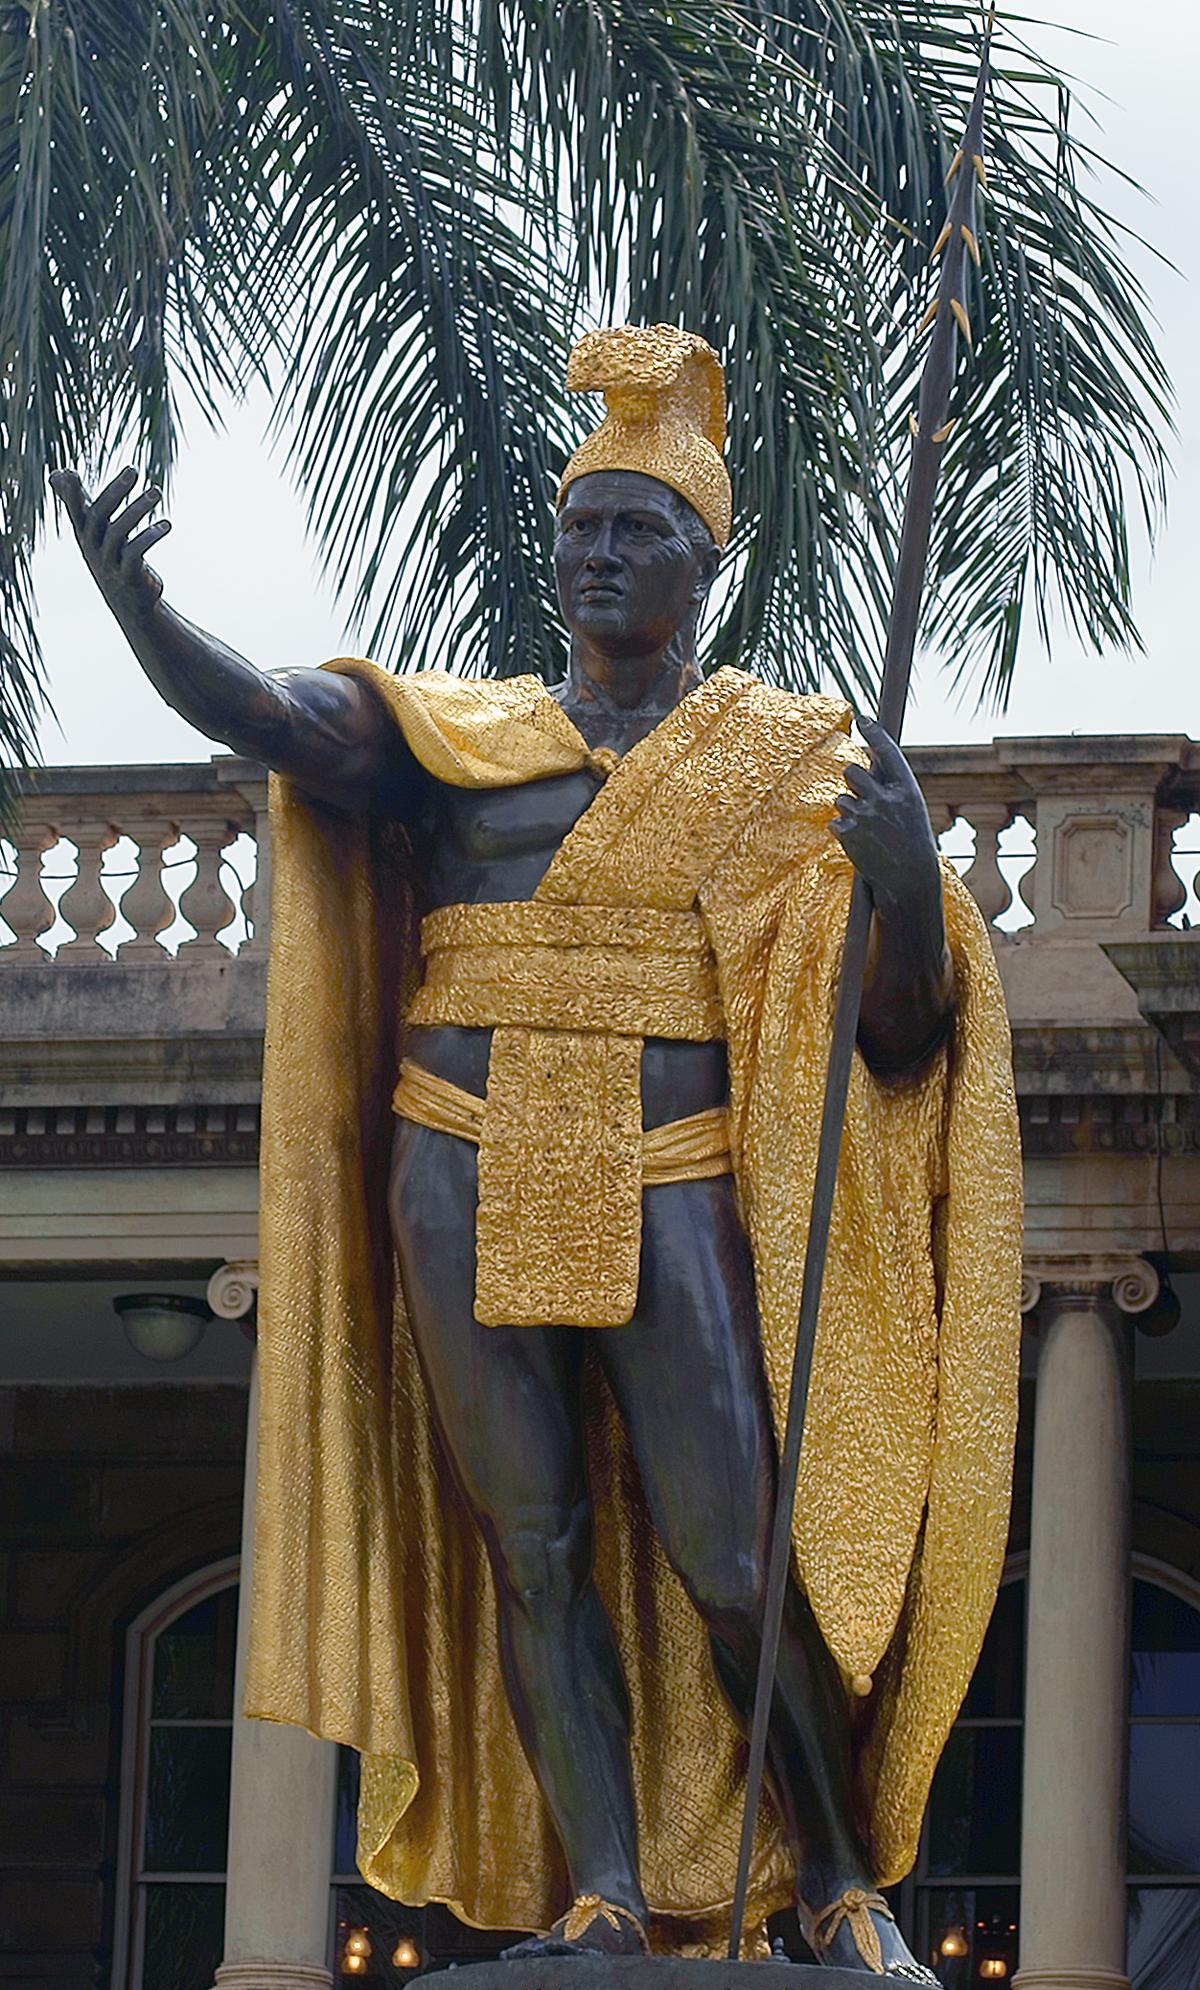 Kamehameha statues - Wikipedia